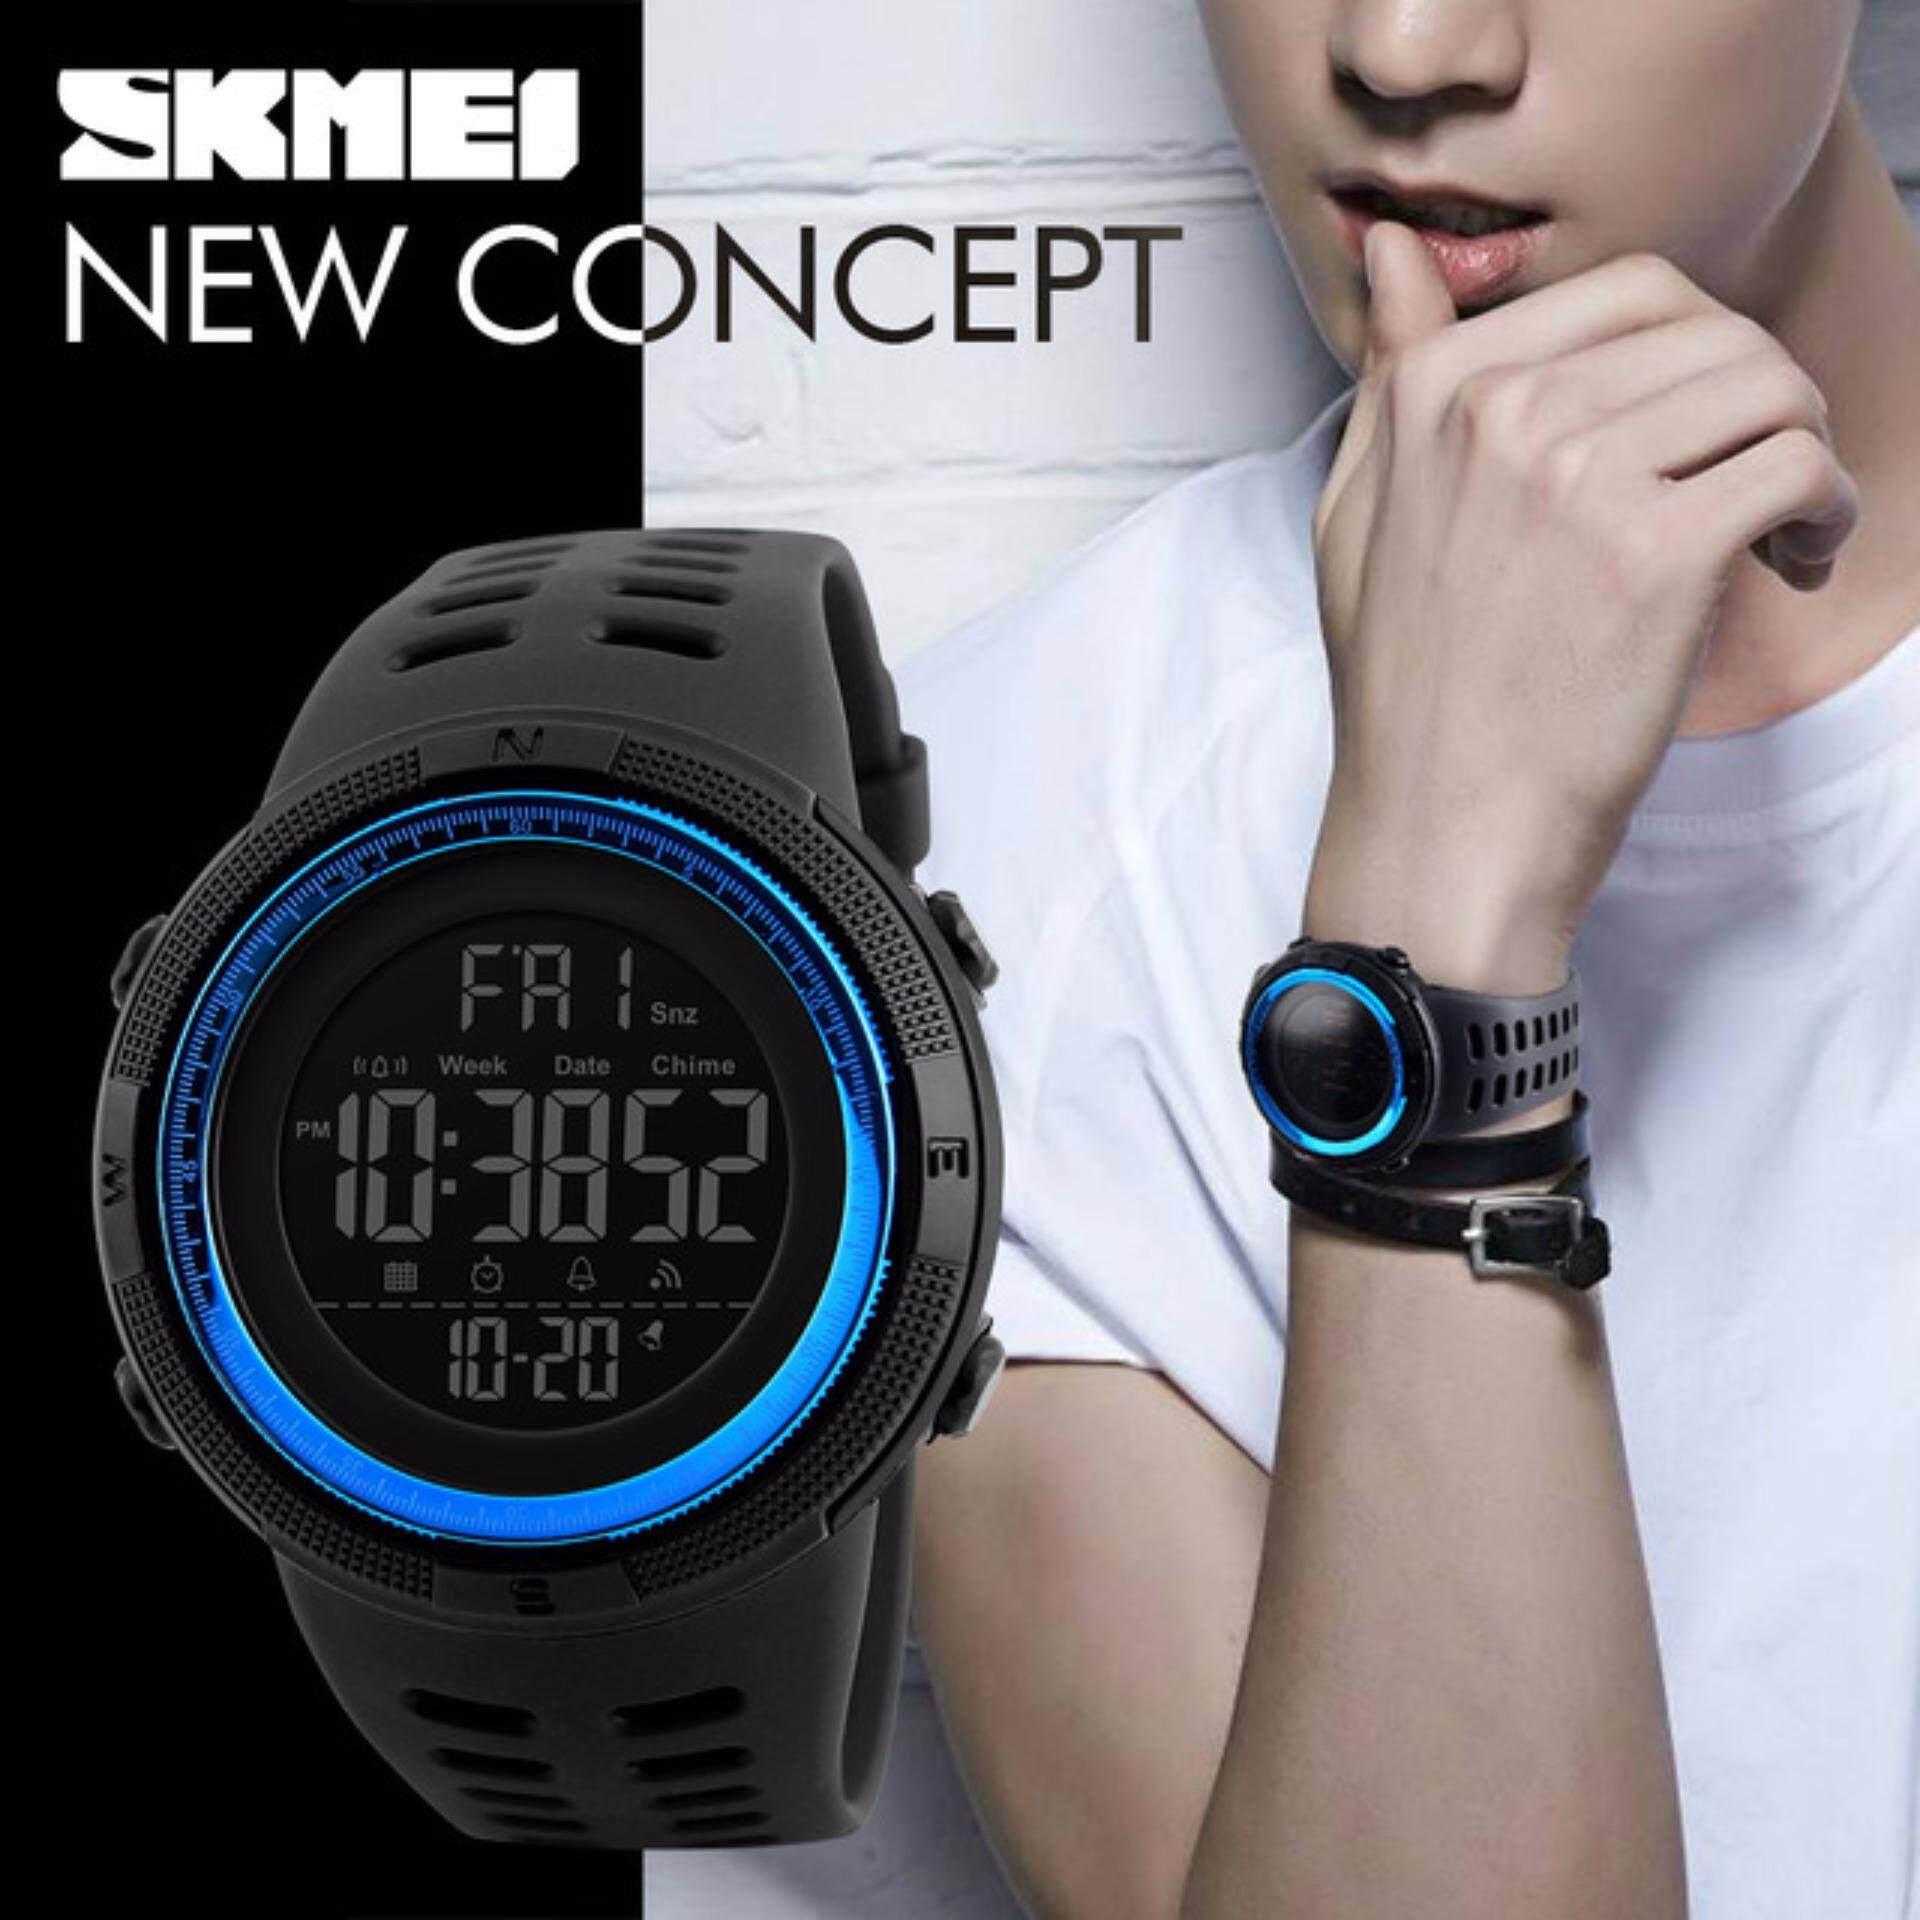 Skmei Watches Price In Malaysia Best Lazada Jam Tangan Pria Watch 9106 Original Water Resistant Black Red